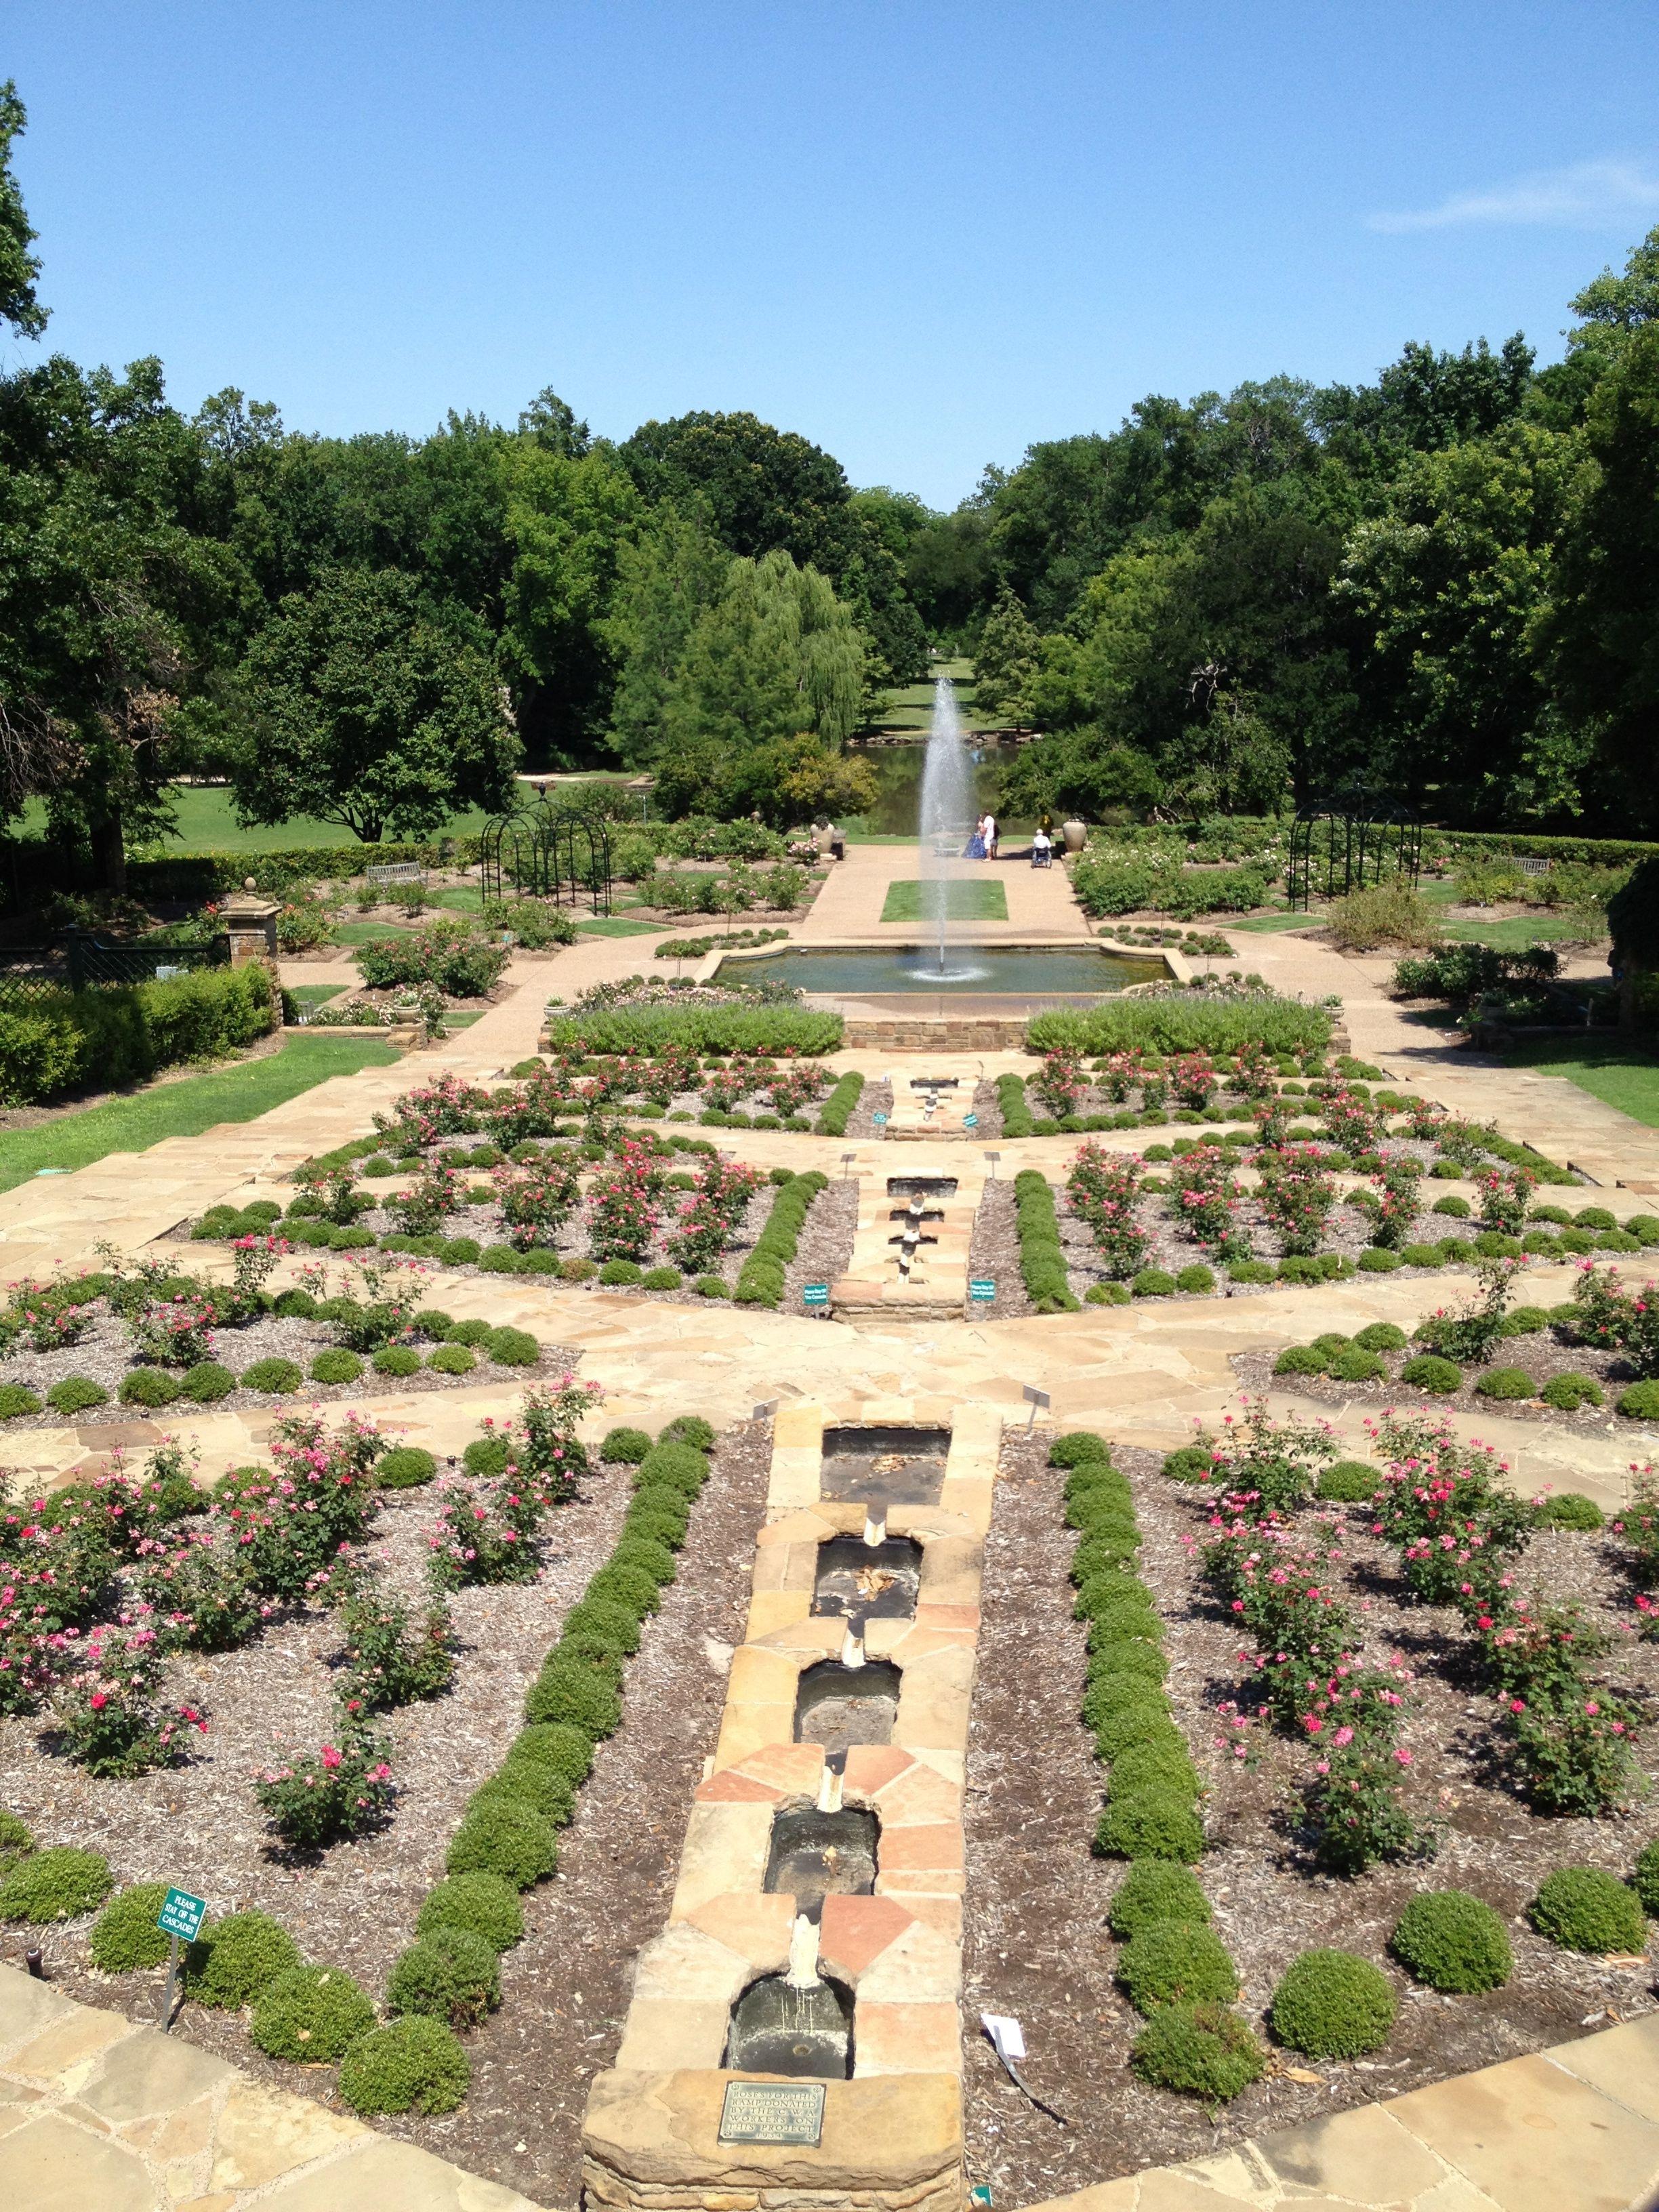 Ft Worth Botanical Gardens Botanical Gardens Garden Places To See